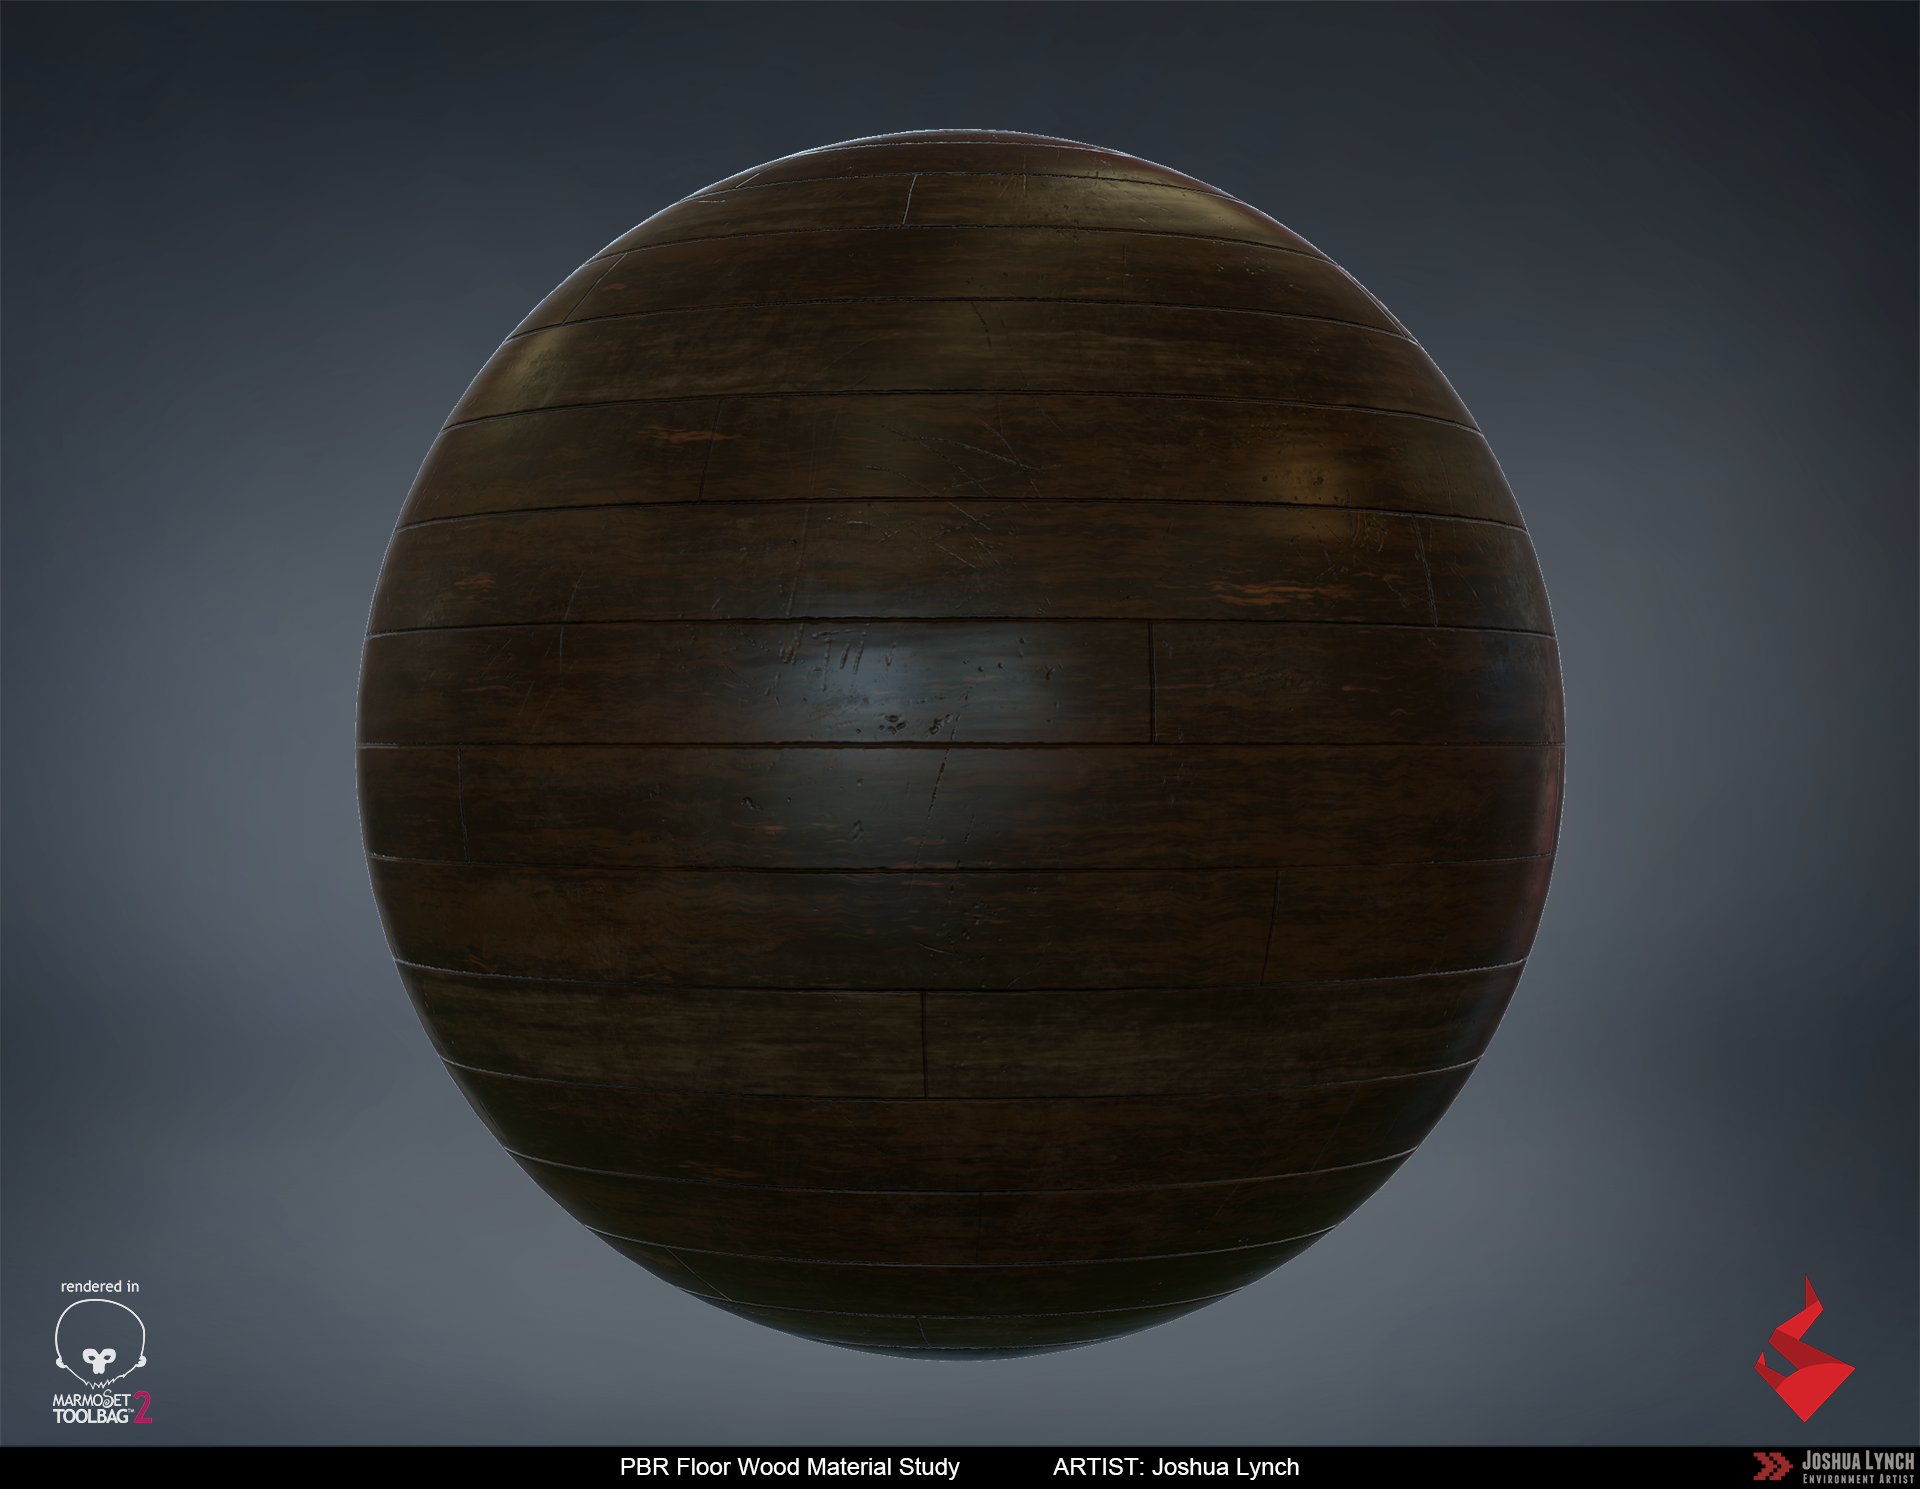 Floor_Wood_Panels_01_Sphere_Rev_02_Layout_Comp_Josh_Lynch.png